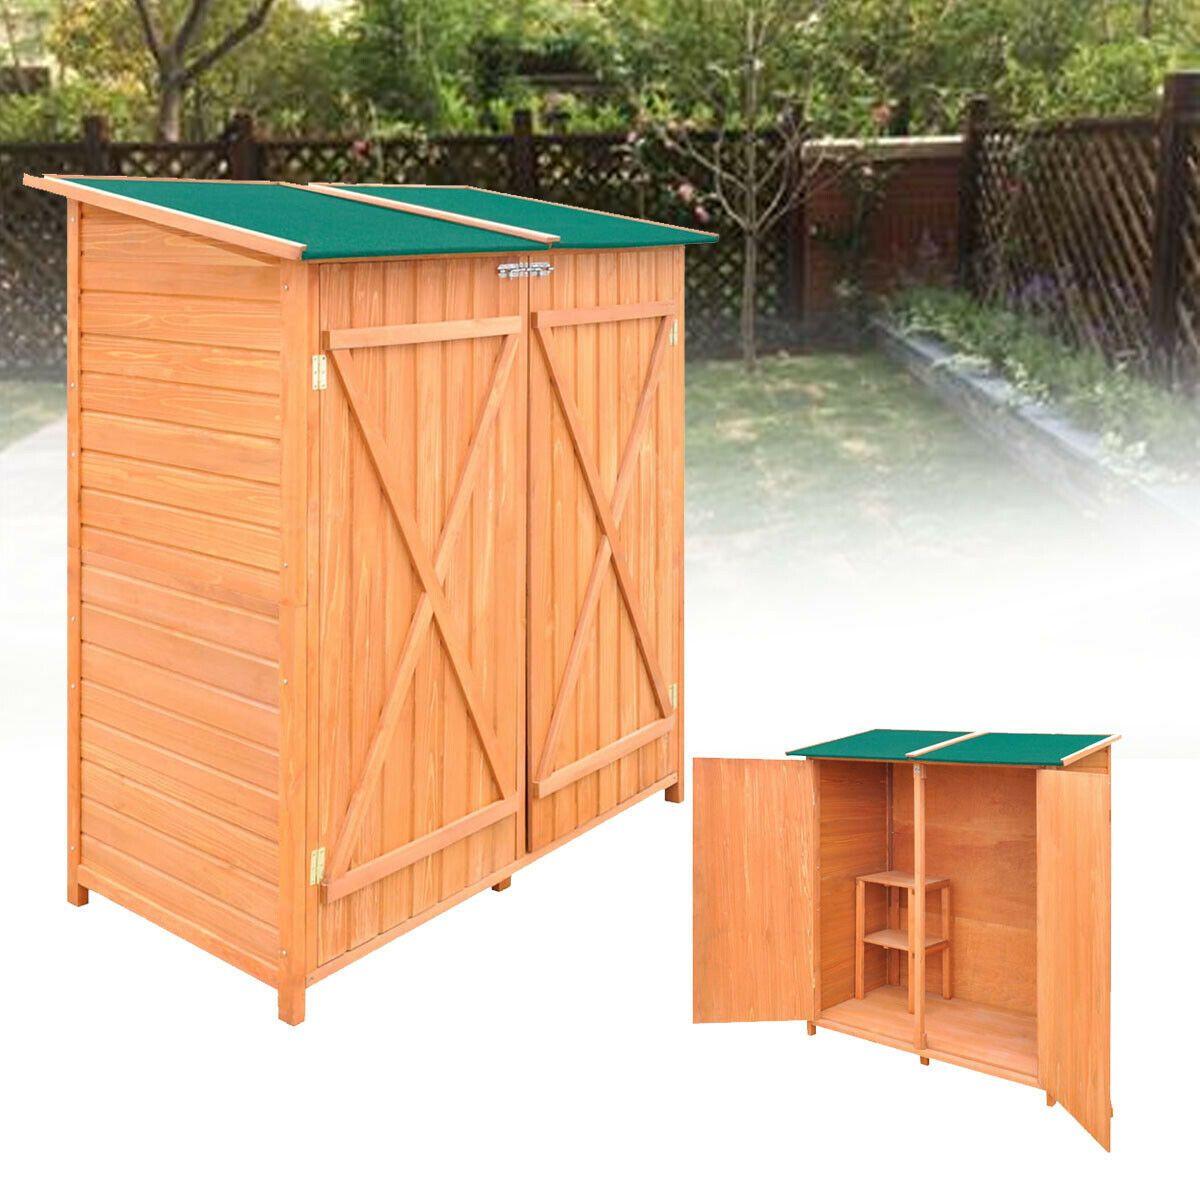 Wooden Storage Shed Cabinet Yard Garden Outdoor Utility Wood